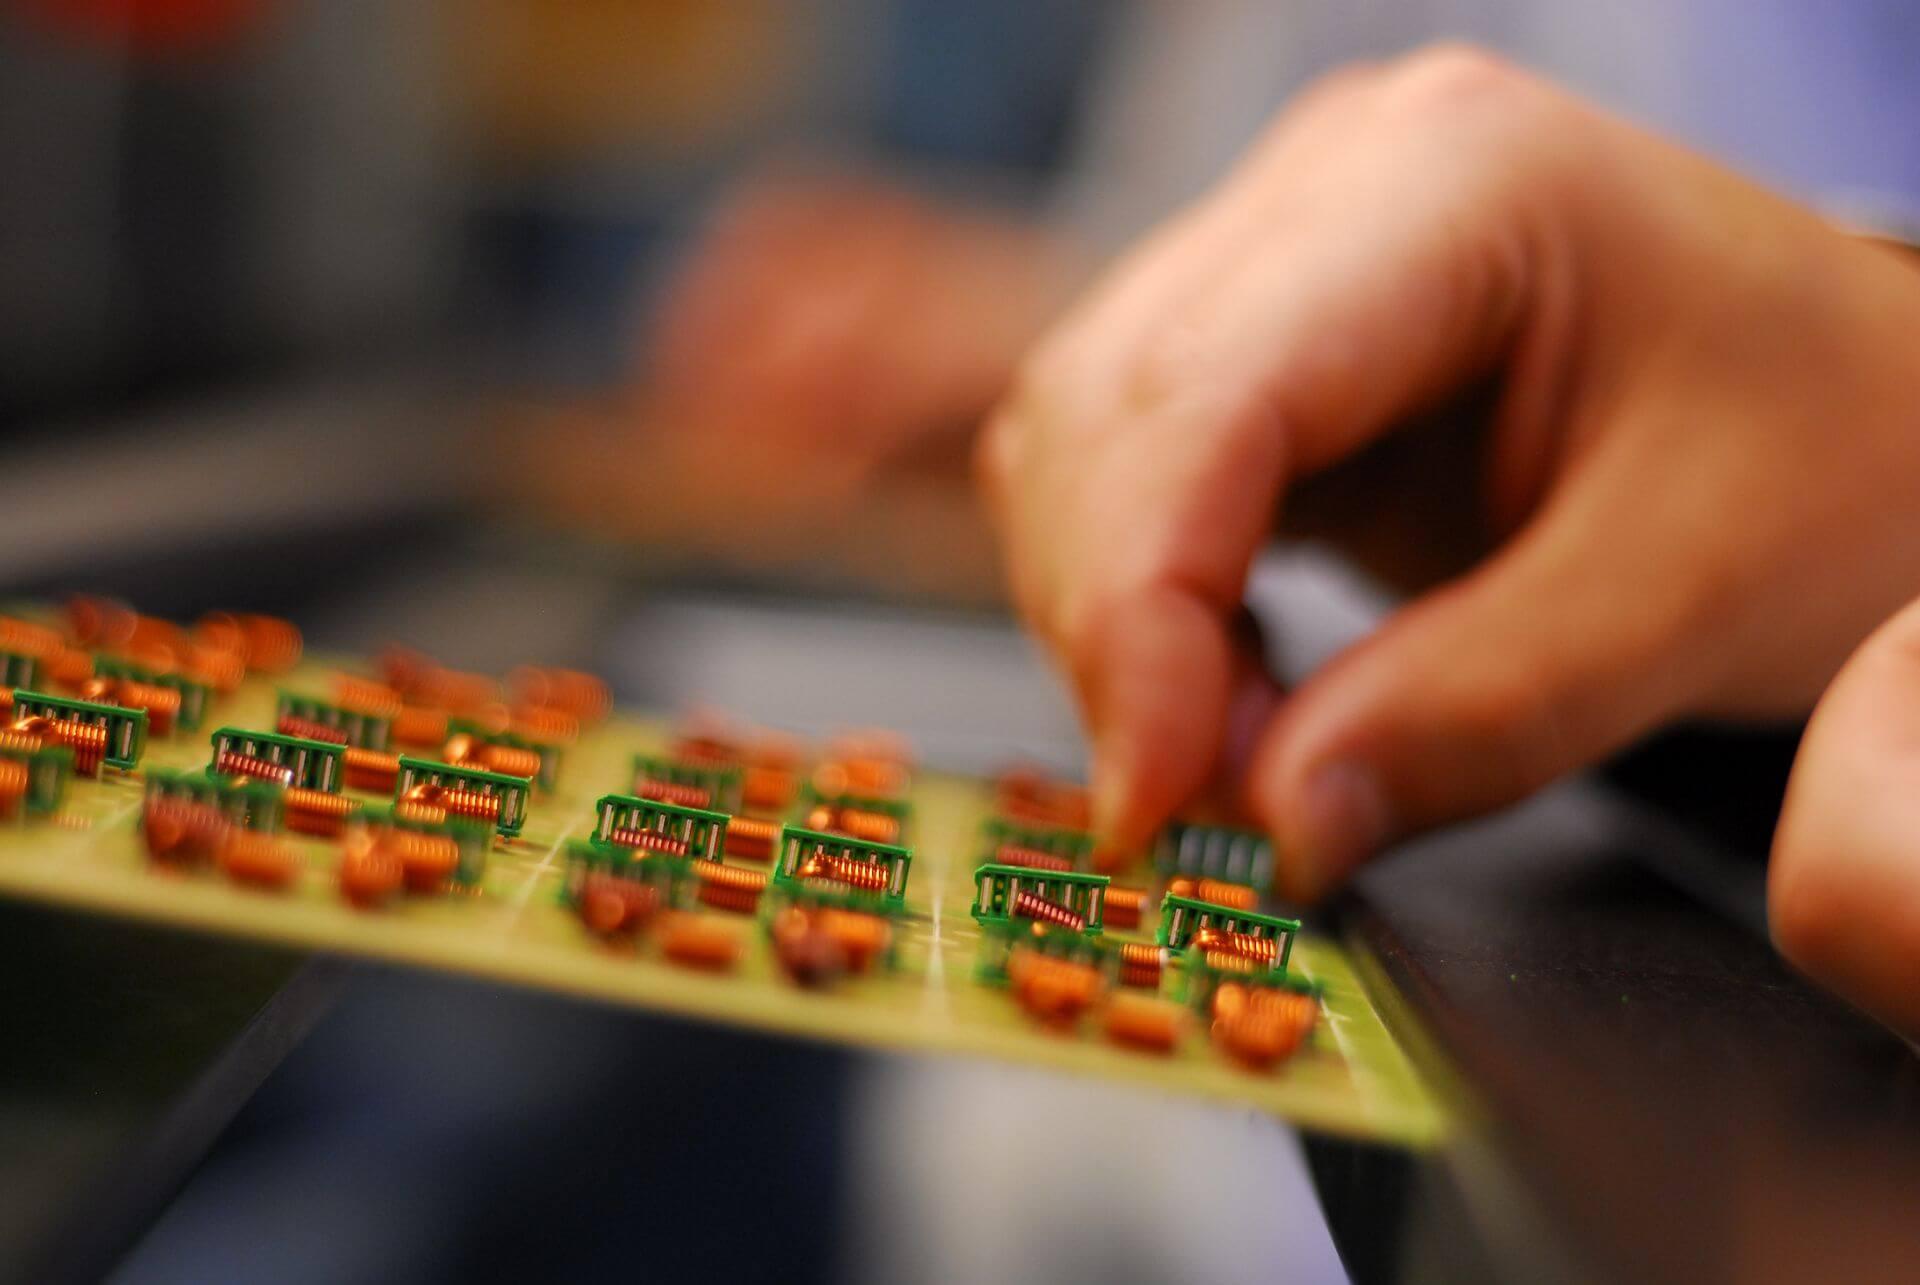 pcb-components-quality-control